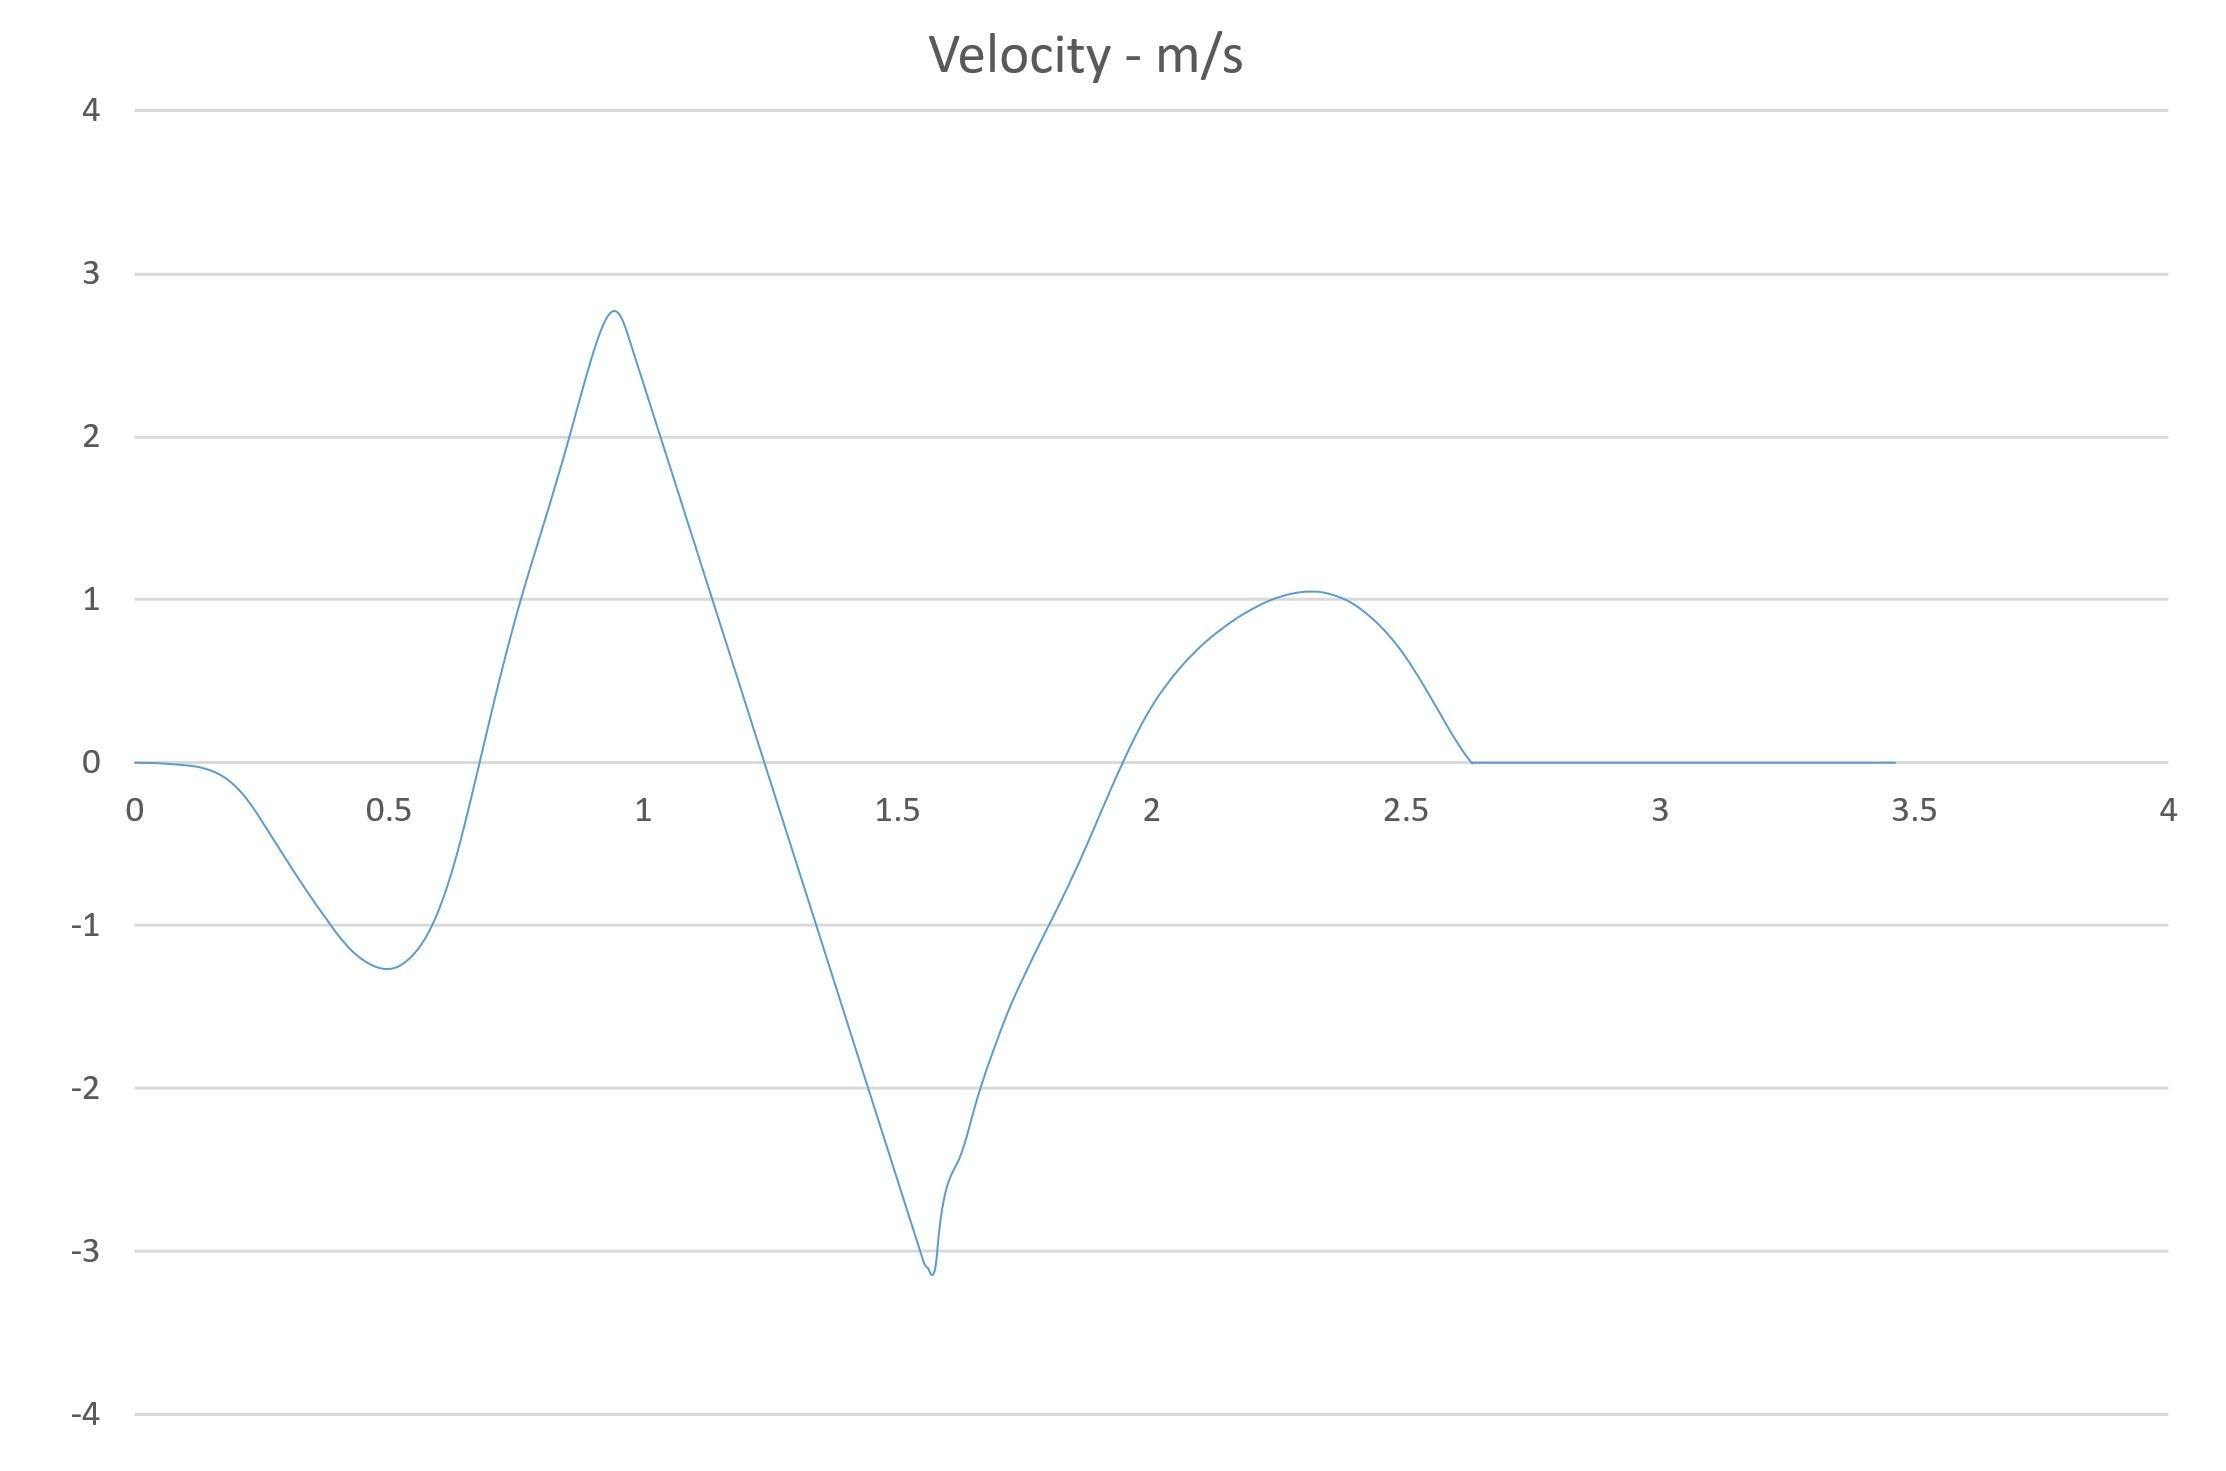 jumping velocity graph